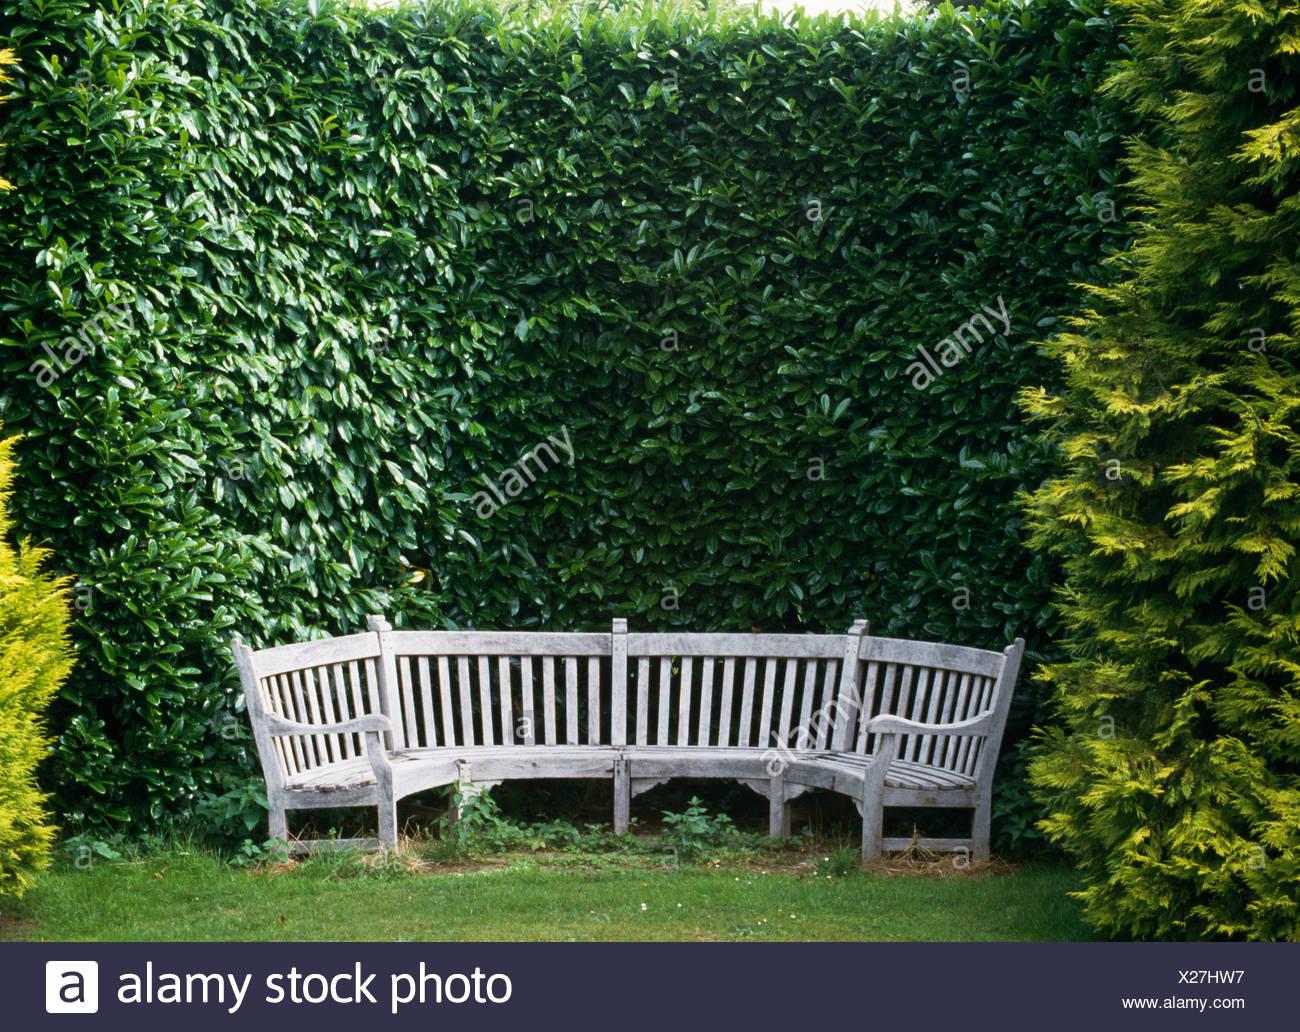 Piastrelle In Legno Florabest : Foto di siepi da giardino siepi ornamentali da giardino gli